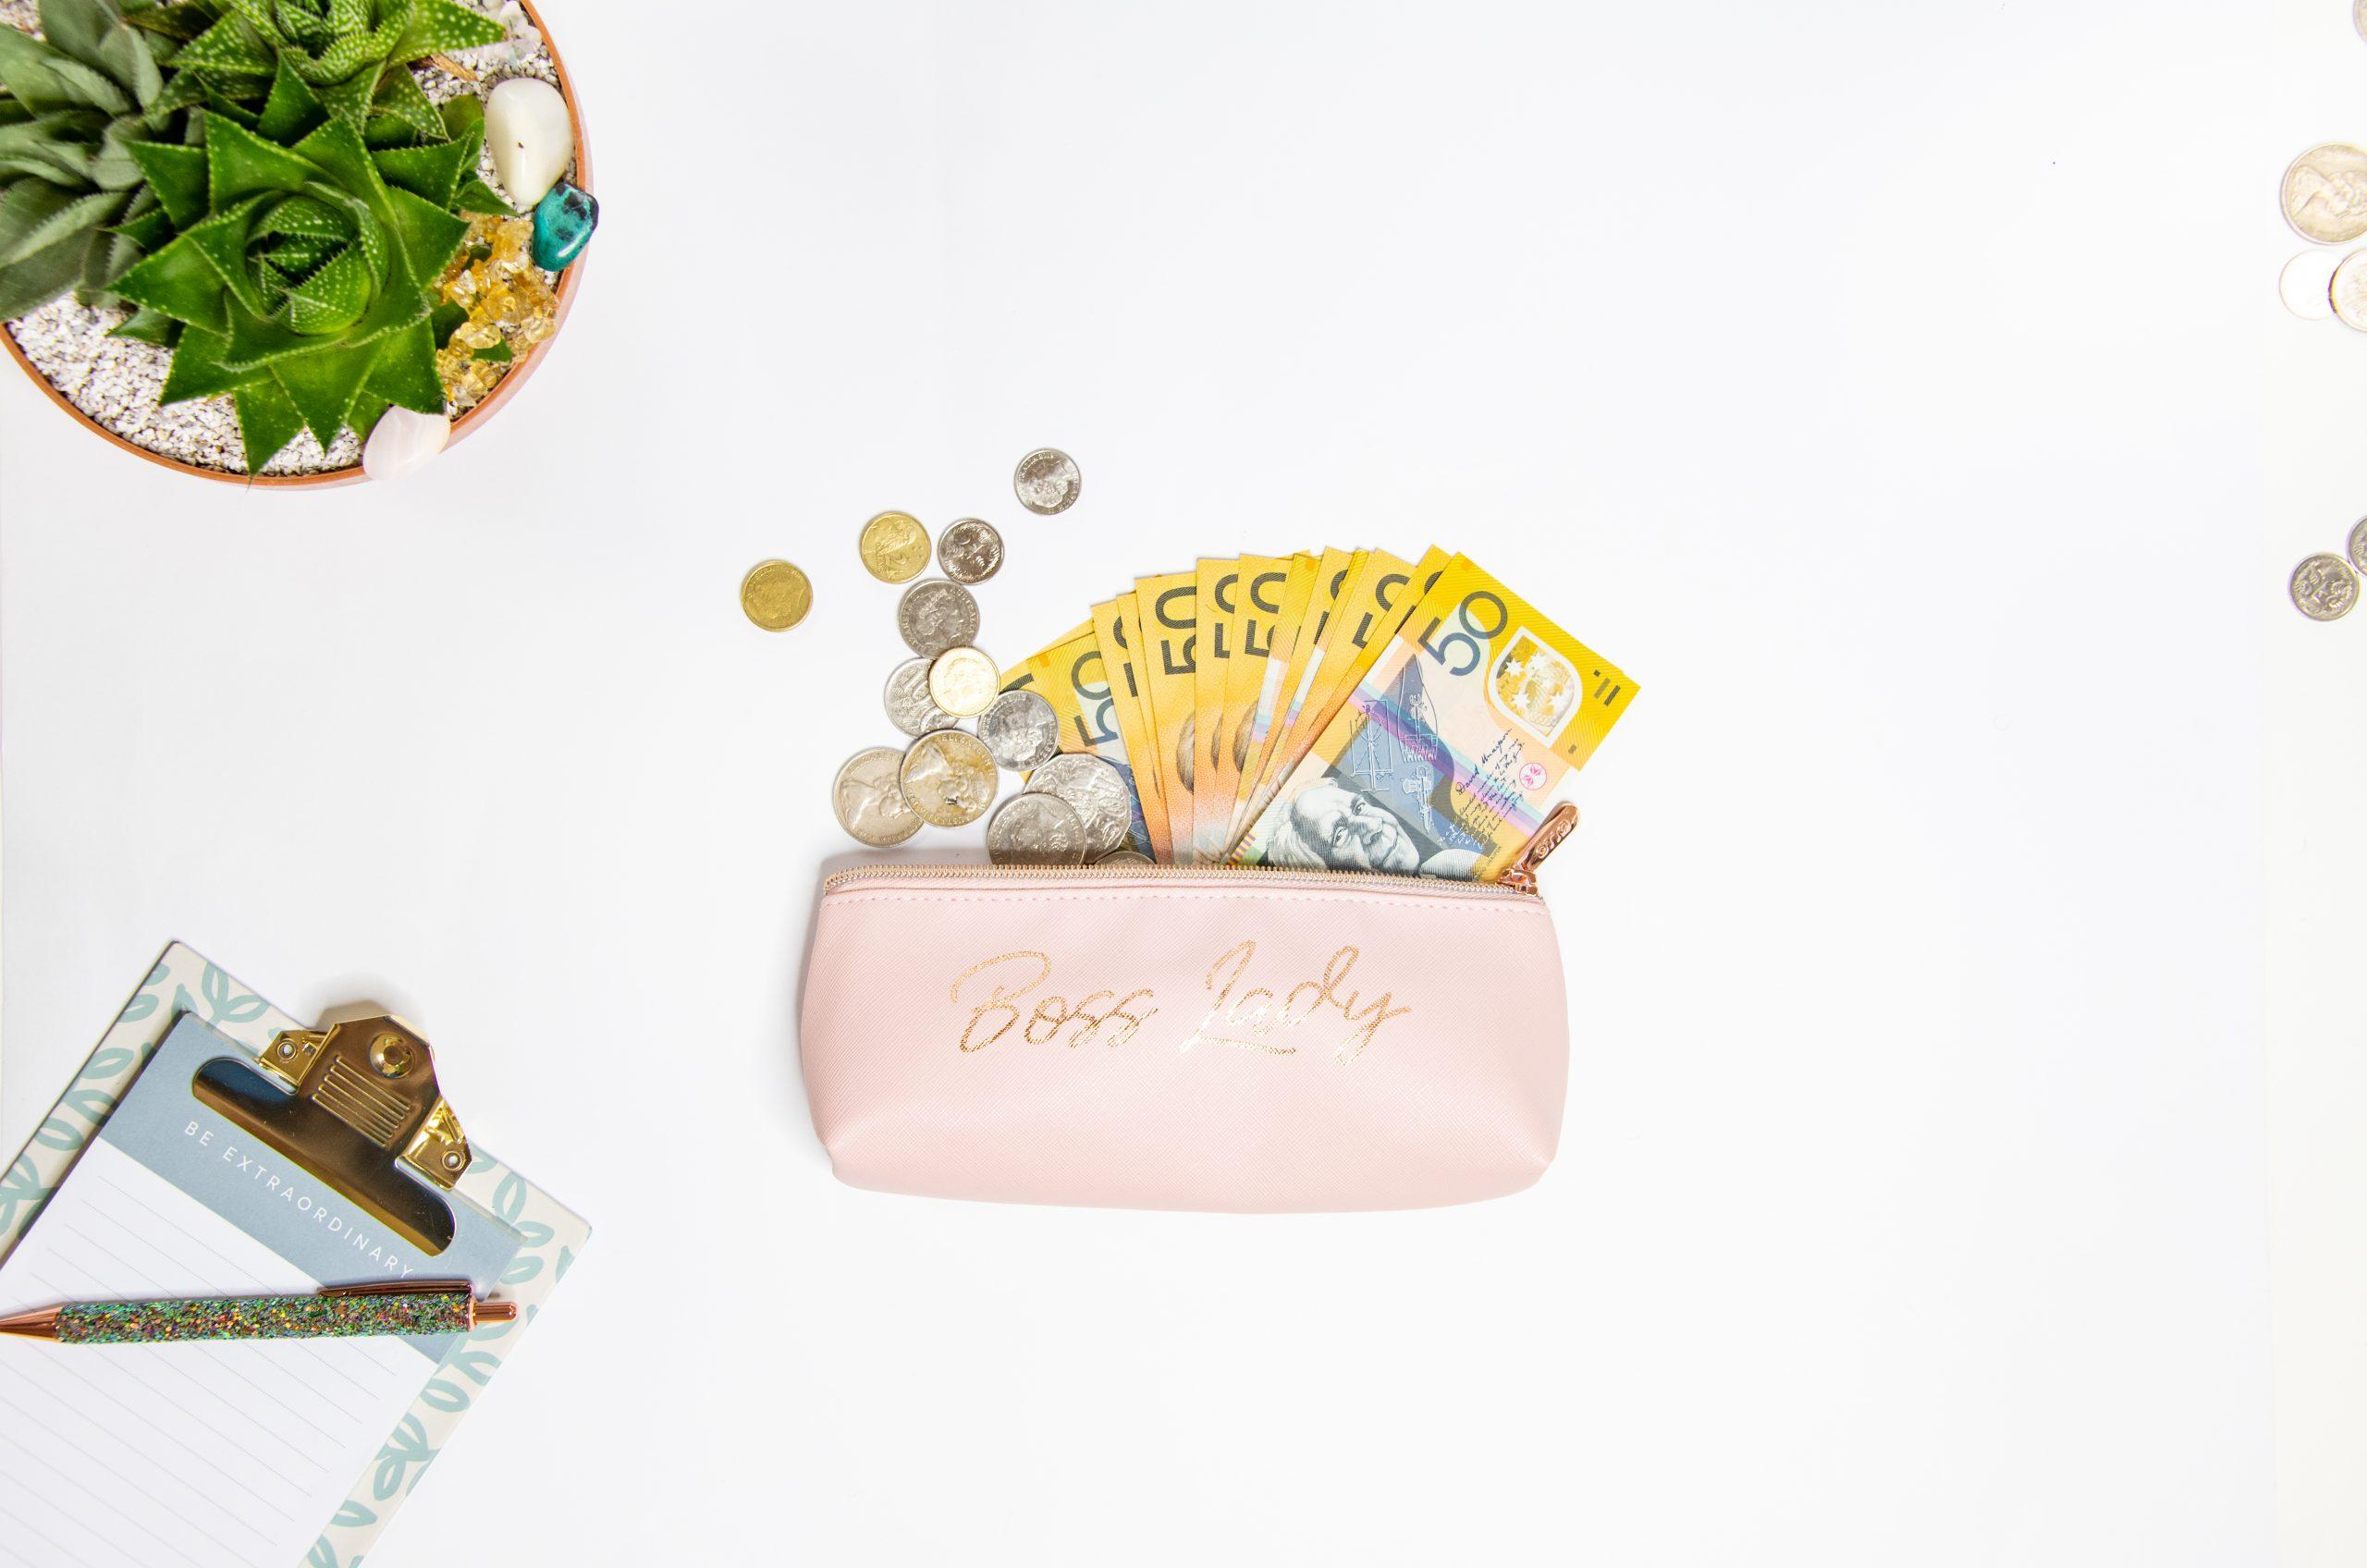 21 Ways to Save Money in 2021